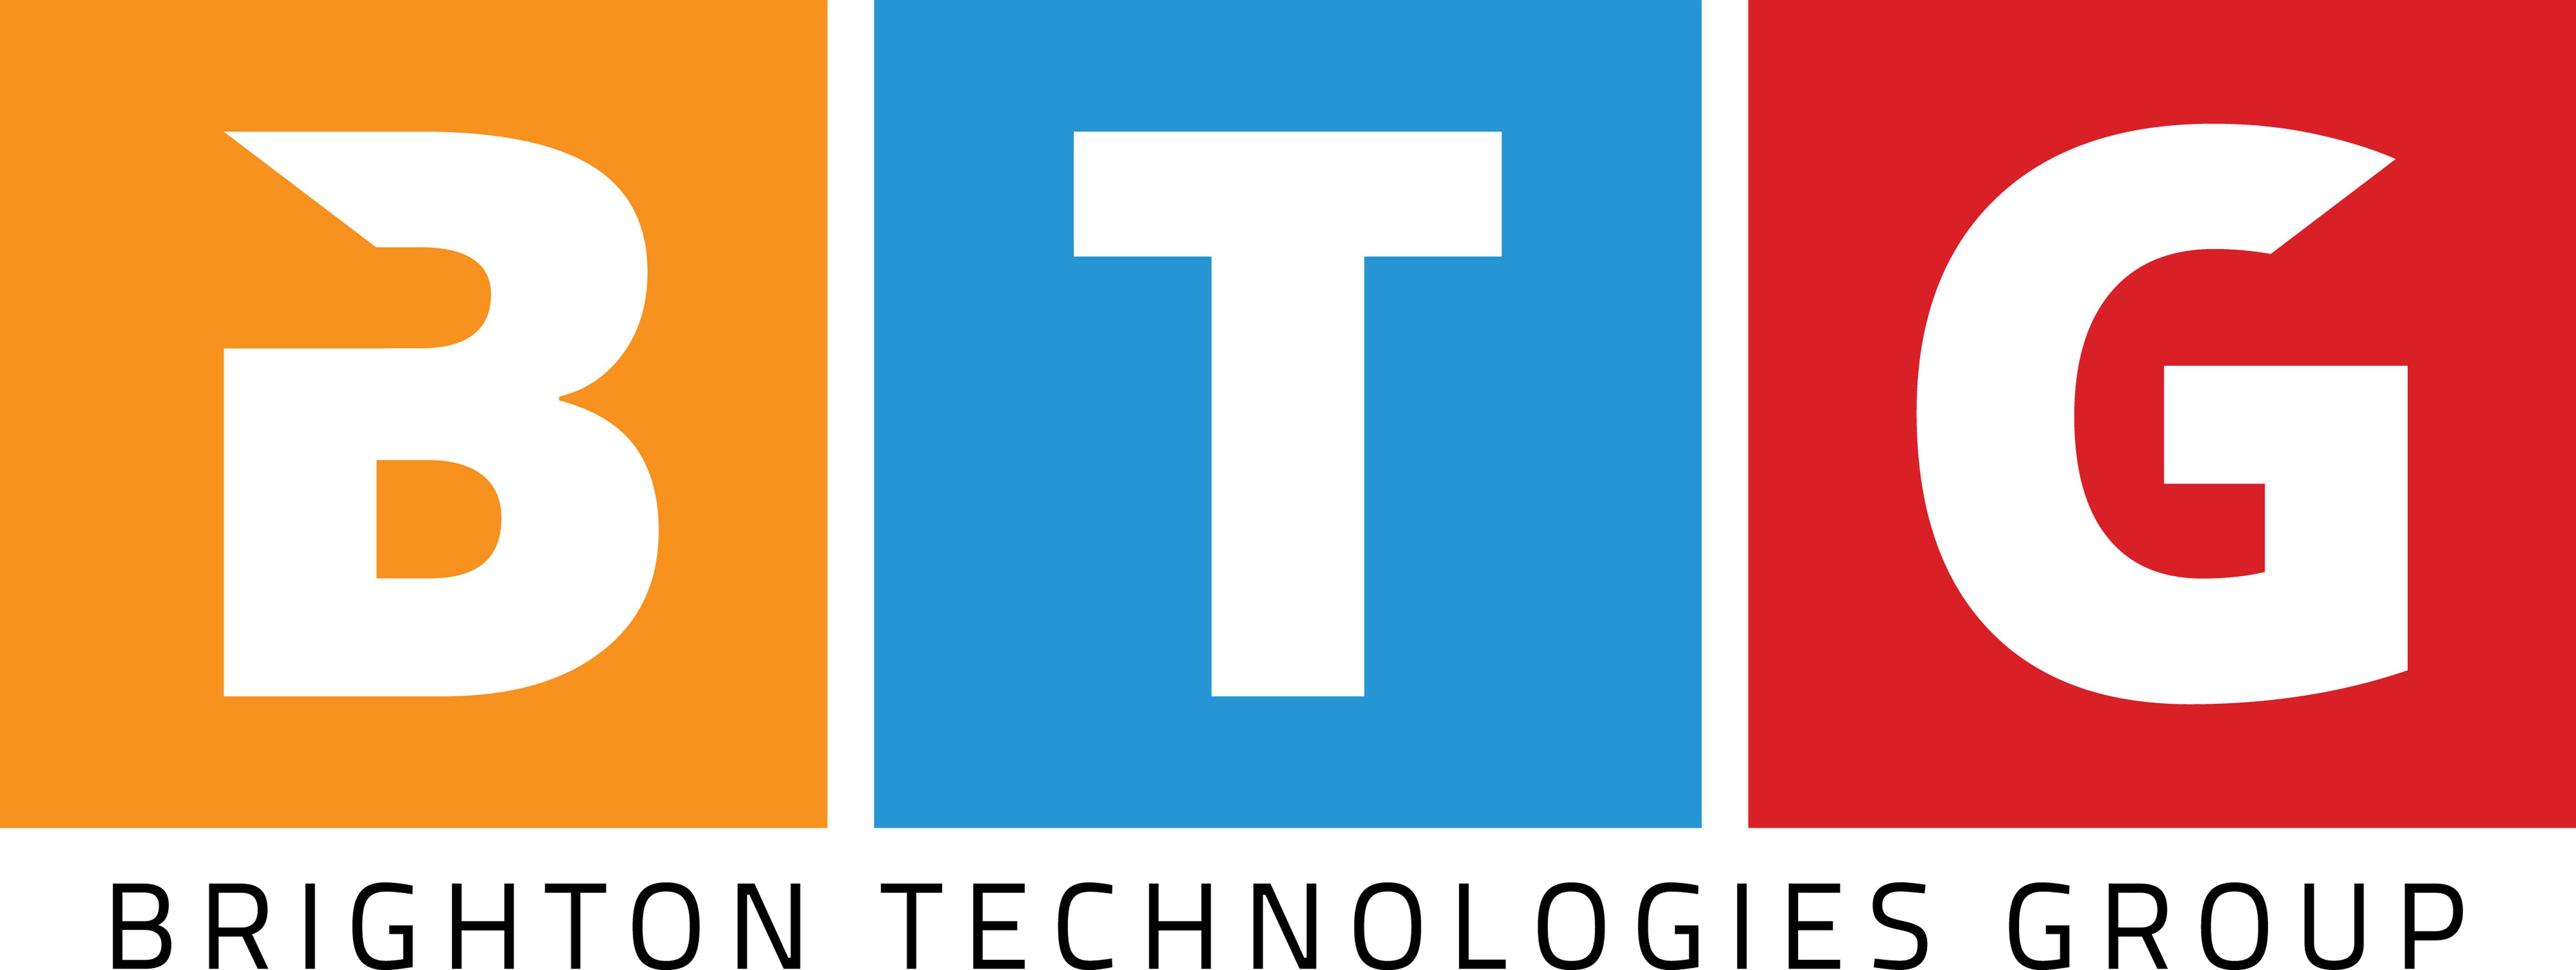 Brighton Technologies Group